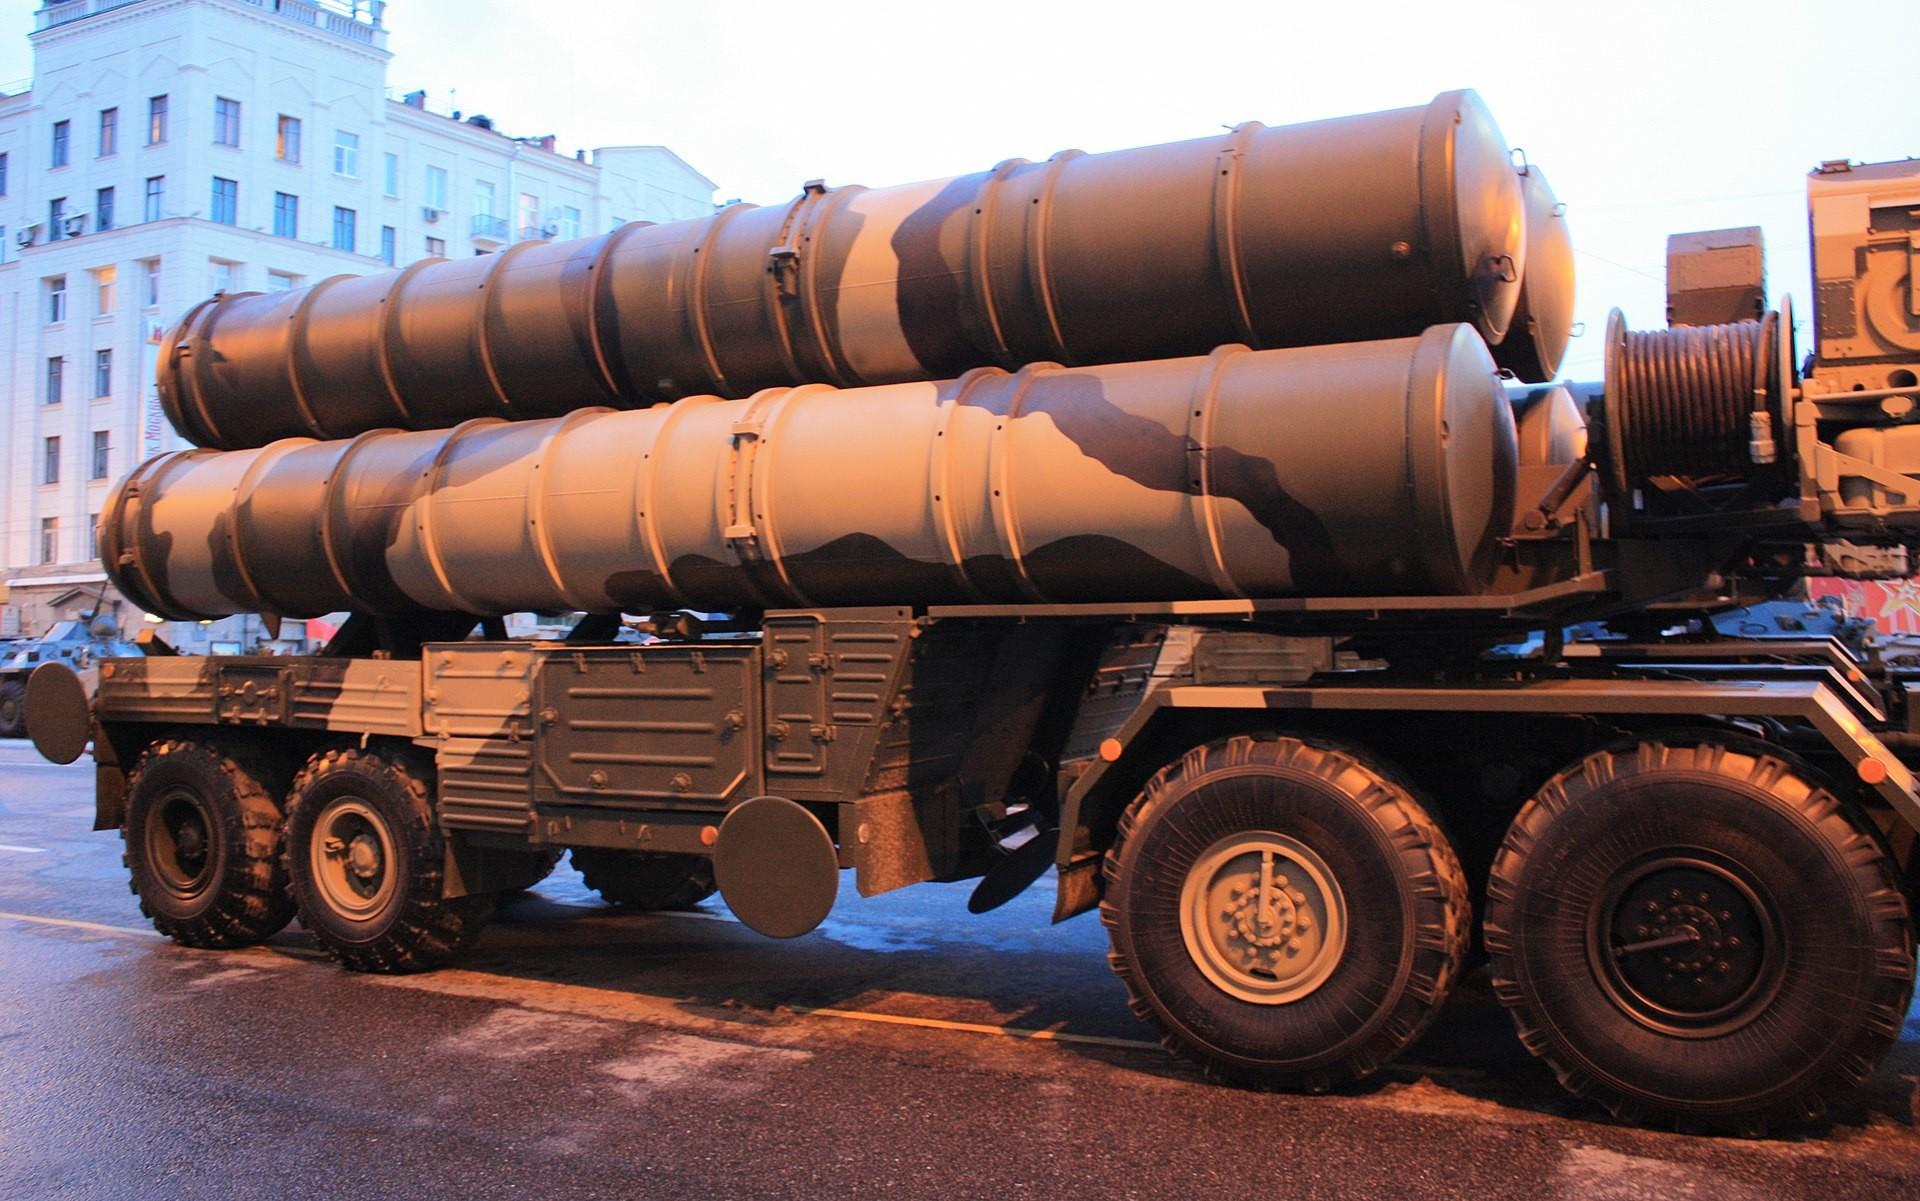 "<p>Фото © <a href=""https://ru.wikipedia.org/wiki/С-400#/media/Файл:Пусковые_установки_зенитных_ракет_ЗРК_С-400_Триумф.jpg"" target=""_self"">Wikipedia</a></p>"